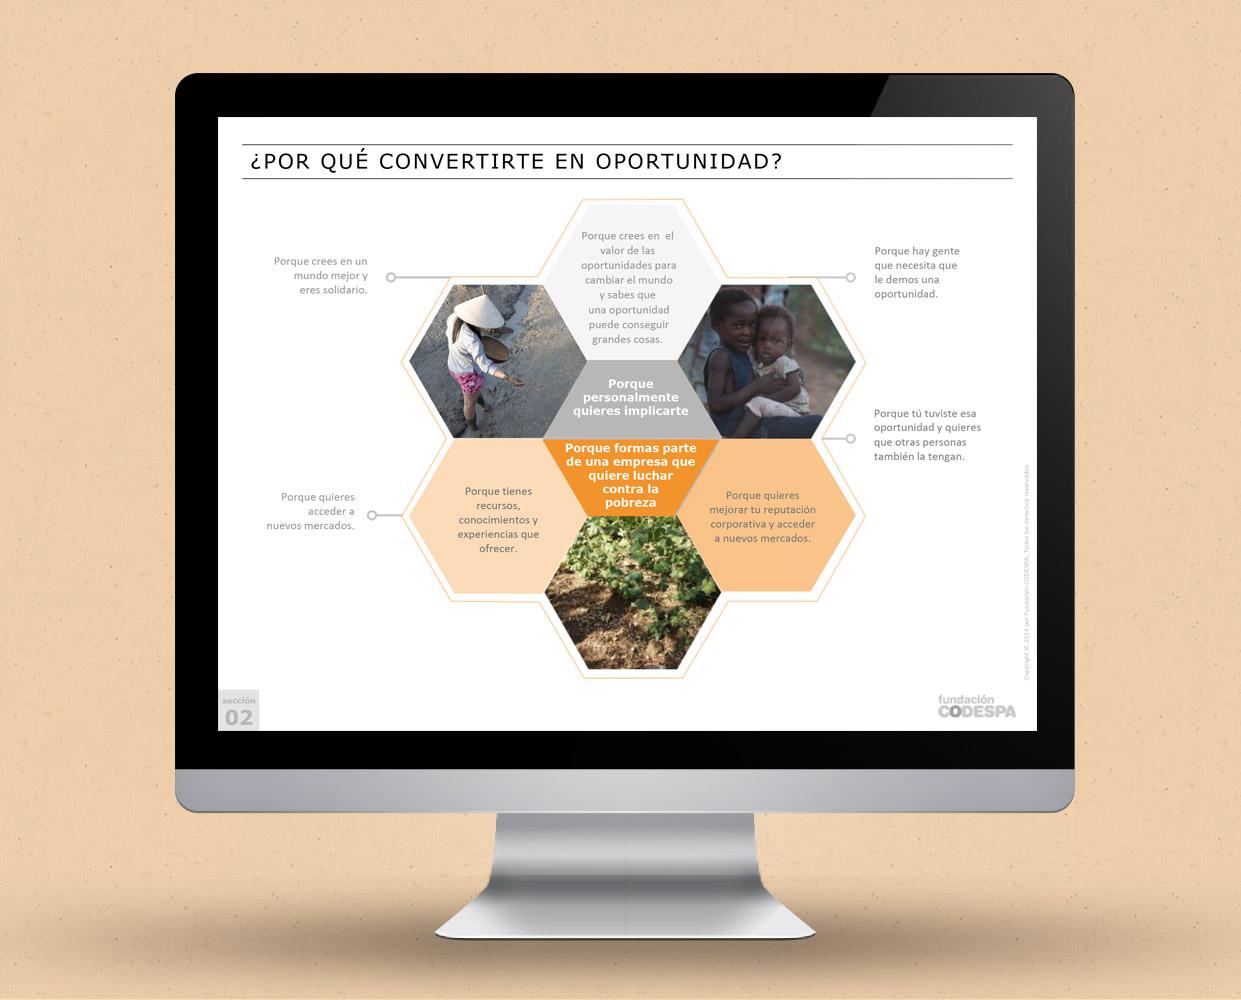 codespa_presentacion_03.jpg